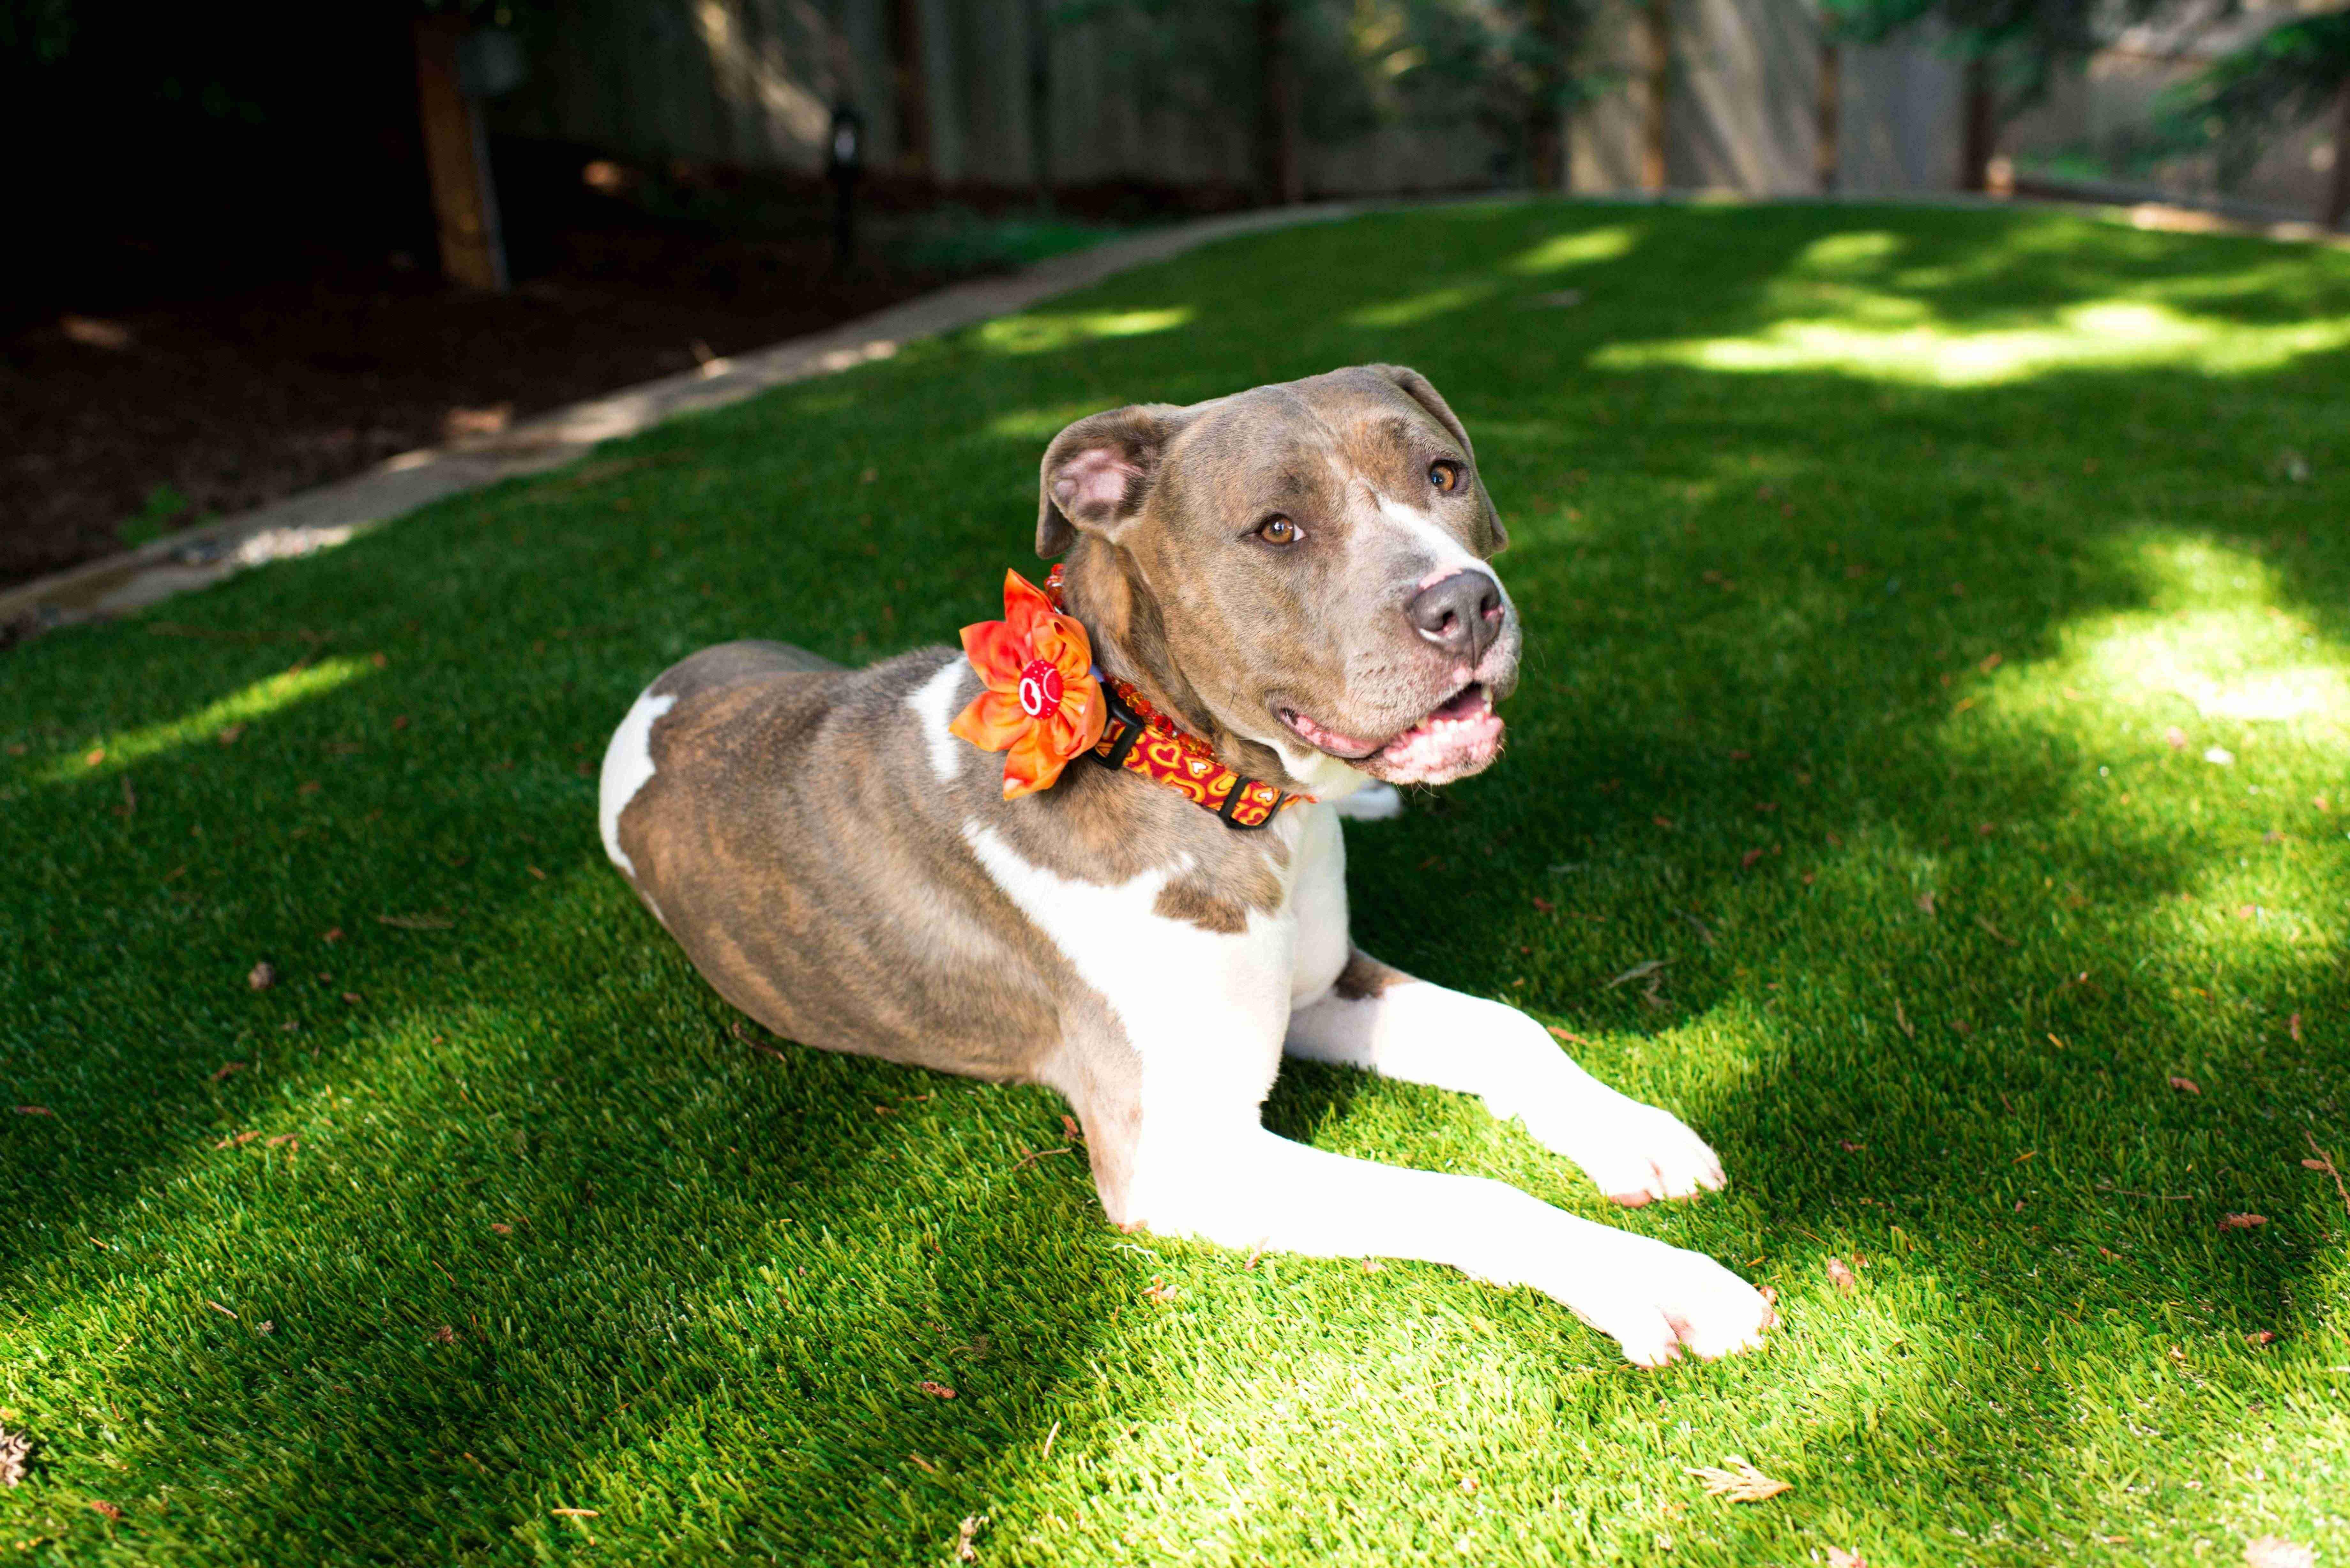 Turf - Gold Coast - Gilston - A dog on Turf